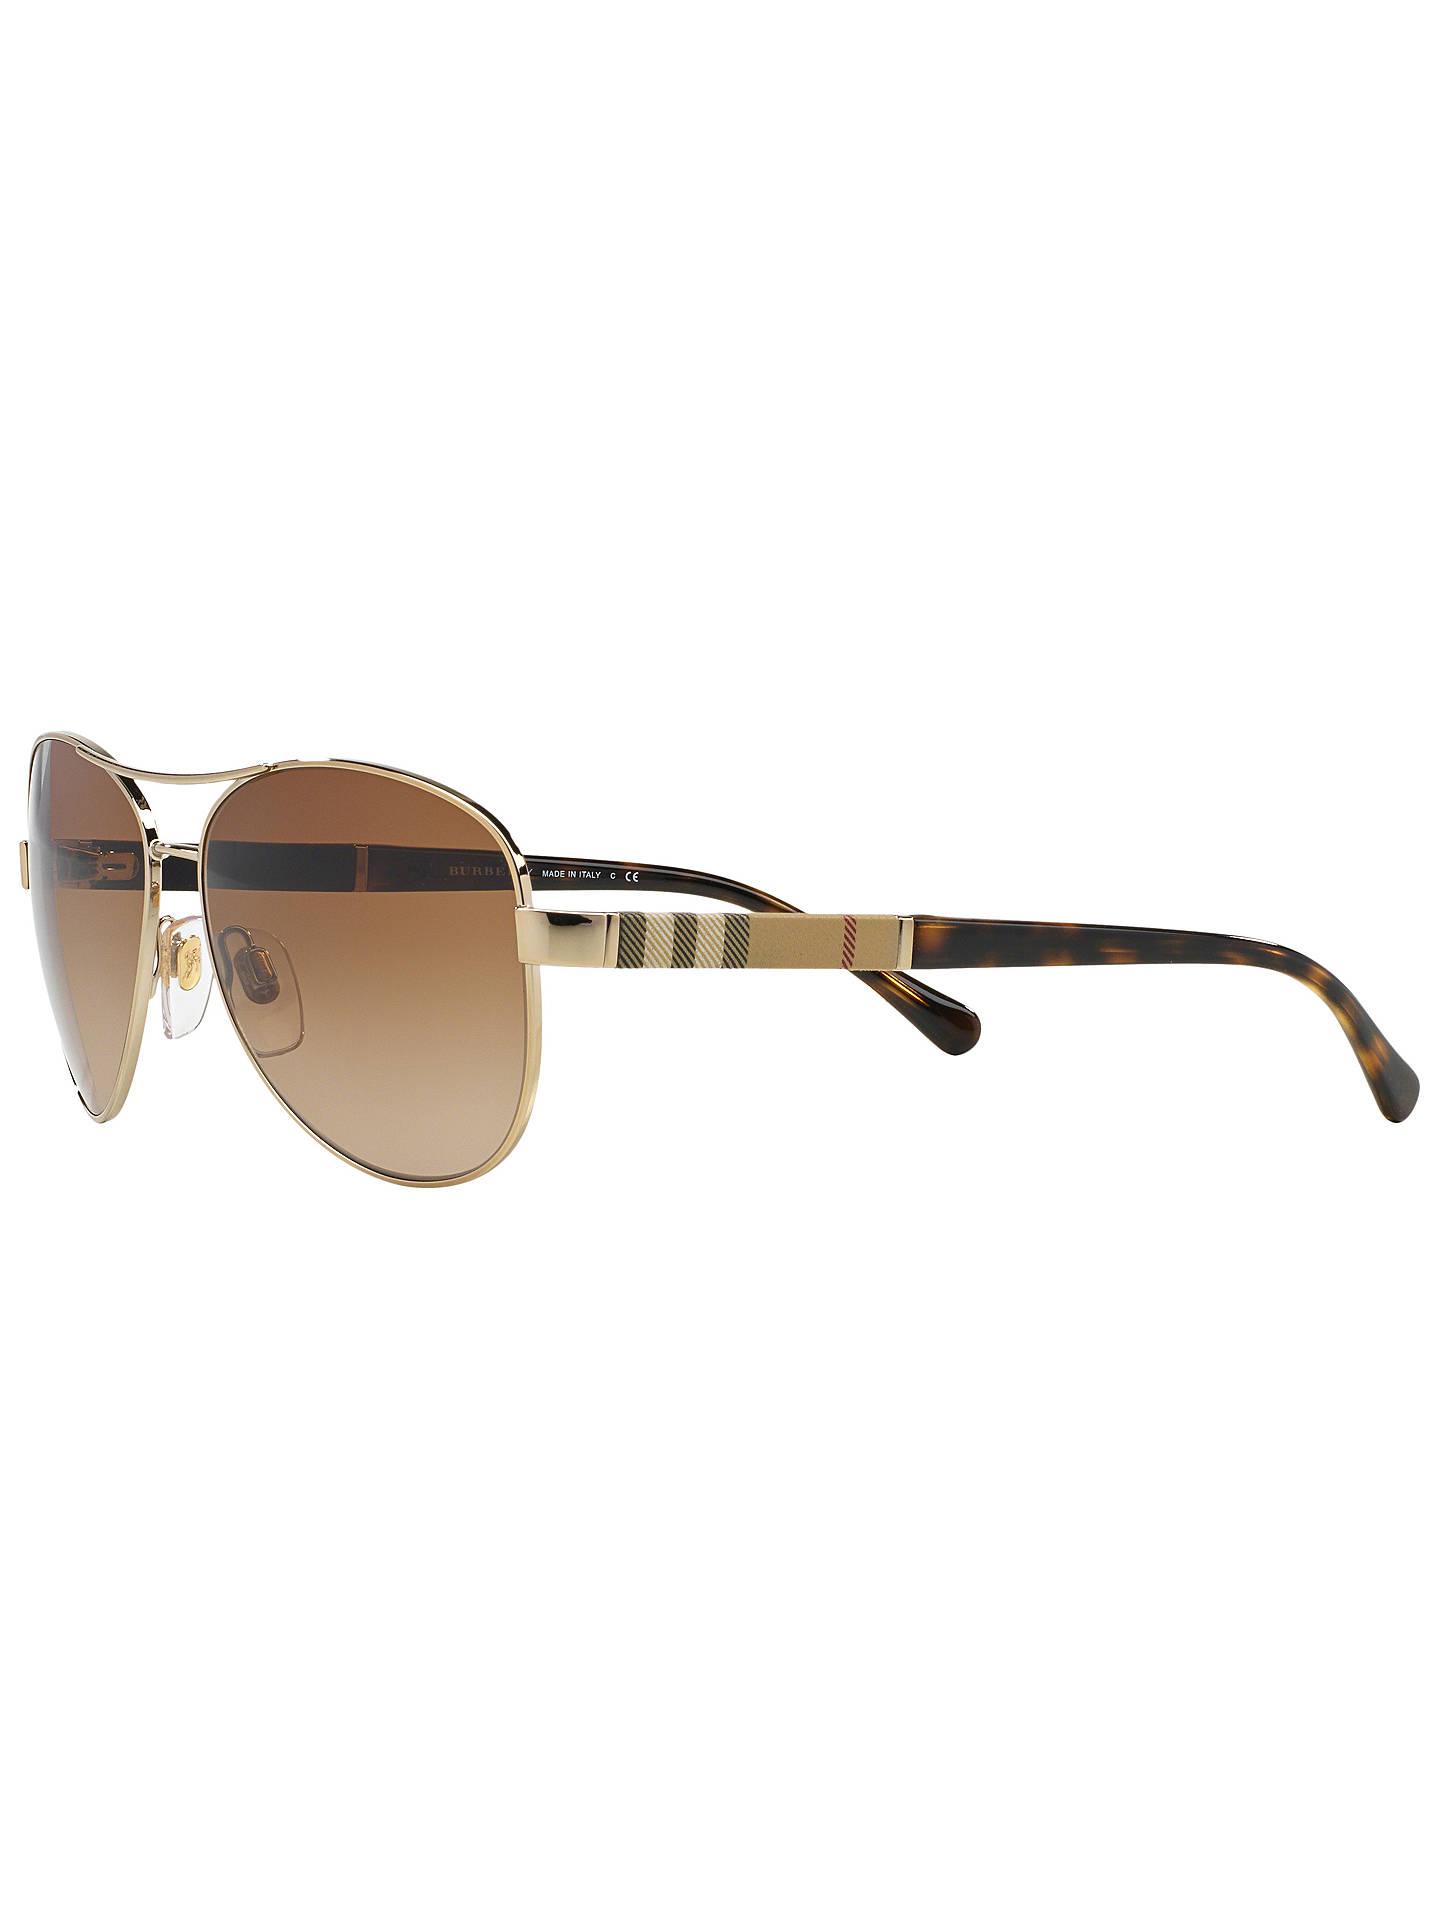 7873a81ad70ed ... Buy Burberry BE3080 Pilot Sunglasses